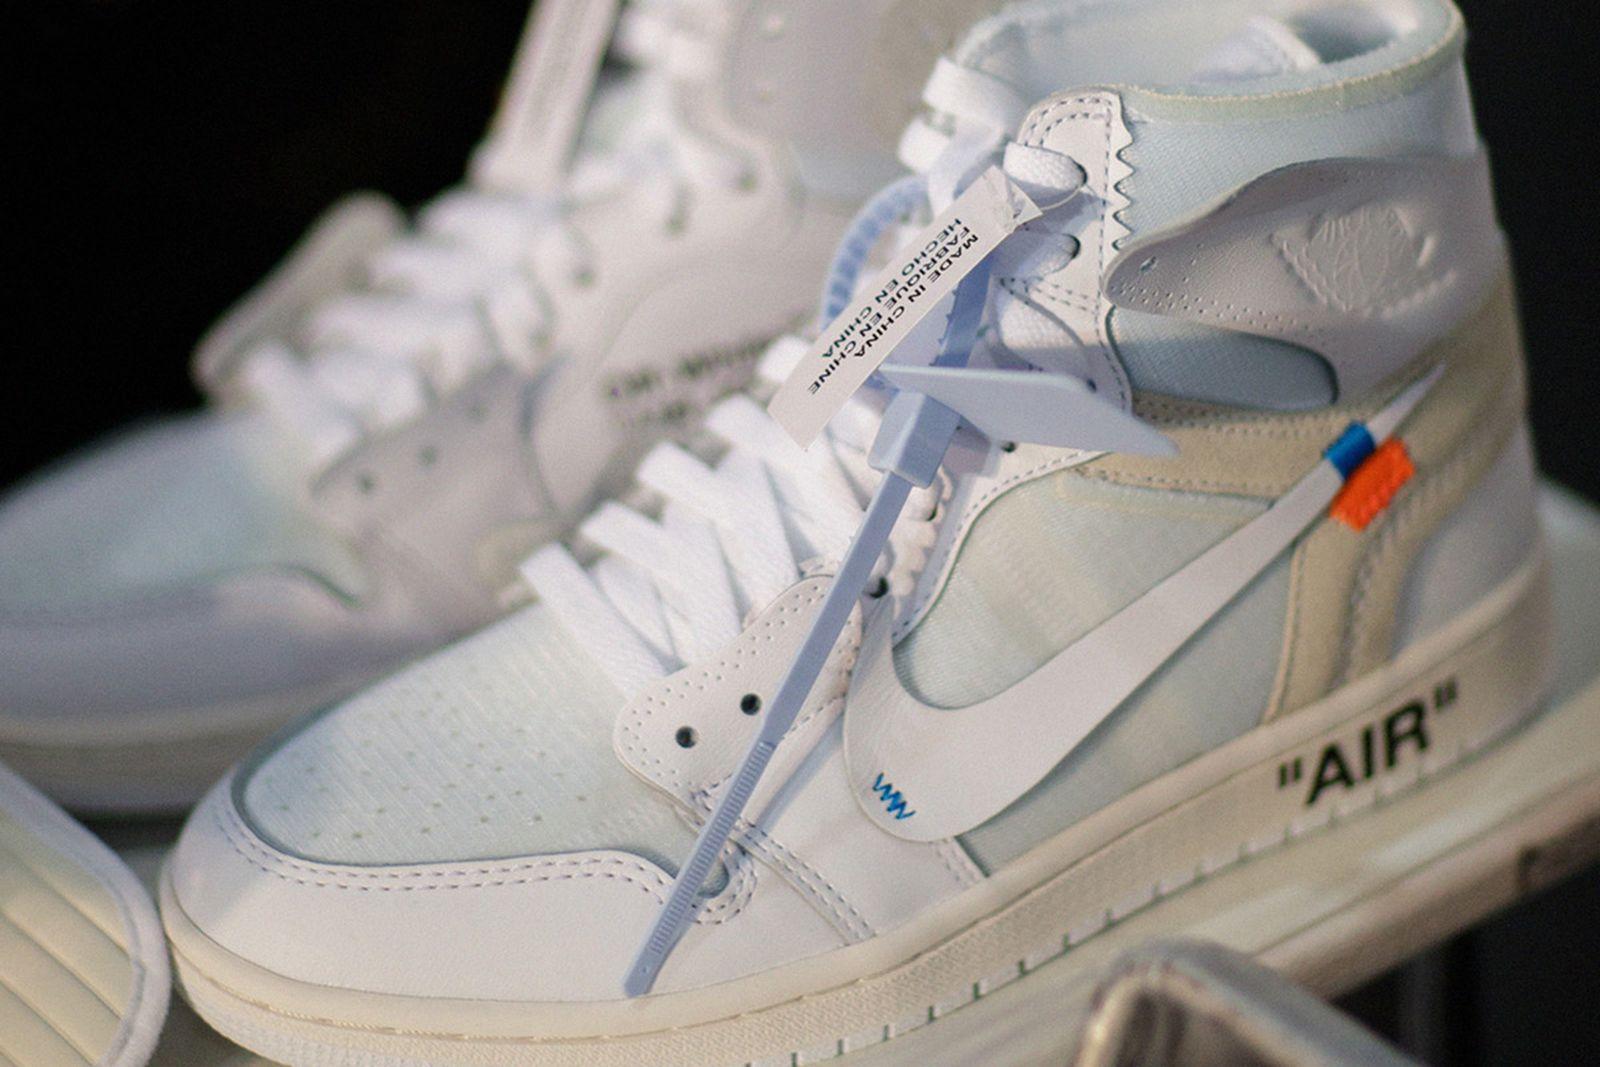 fw18 fashion week best sneakers main 2Chainz Maison Margiela Nike